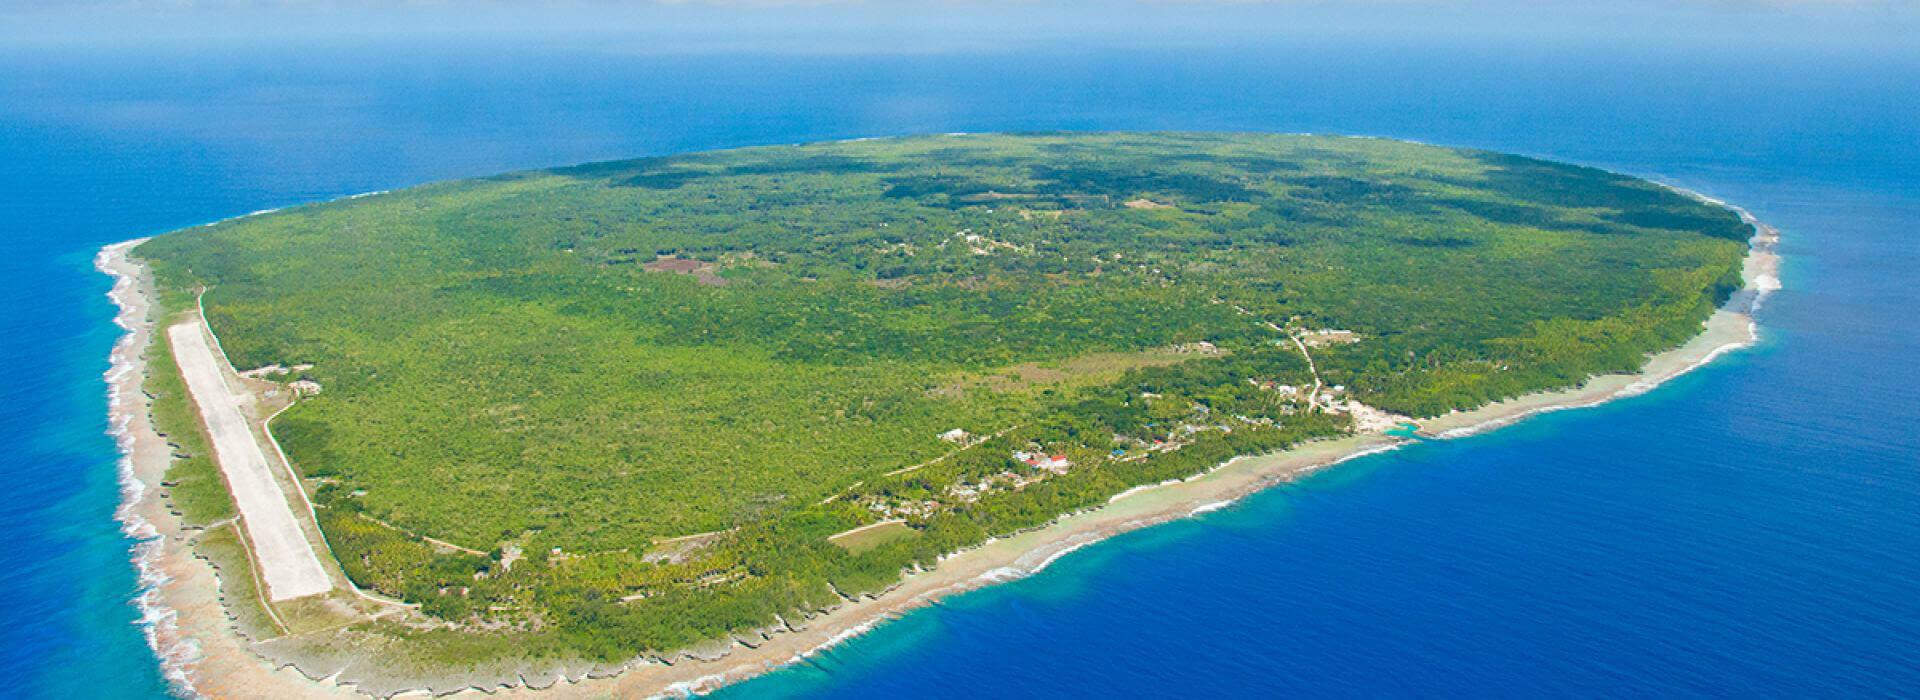 Isla Mauke 7 increíbles destinos subestimados por los viajeros